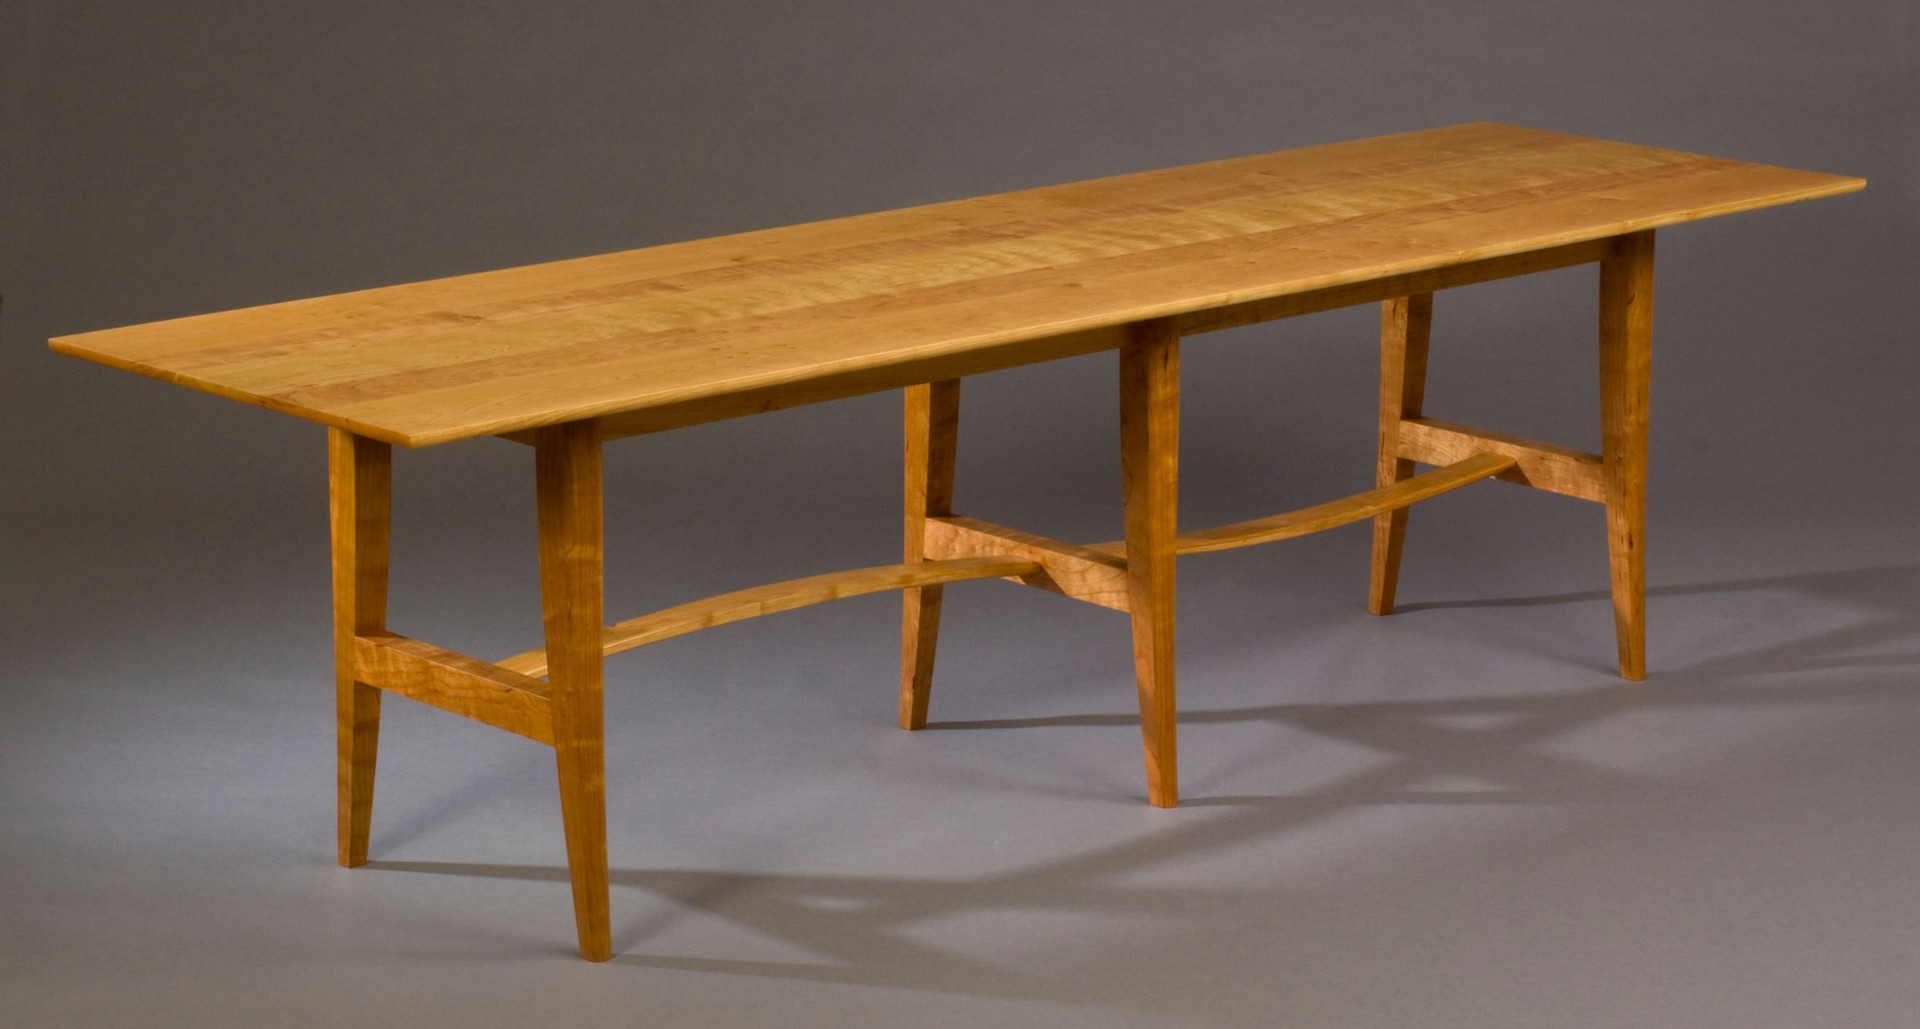 wix_cherry_dining_table (1).jpg